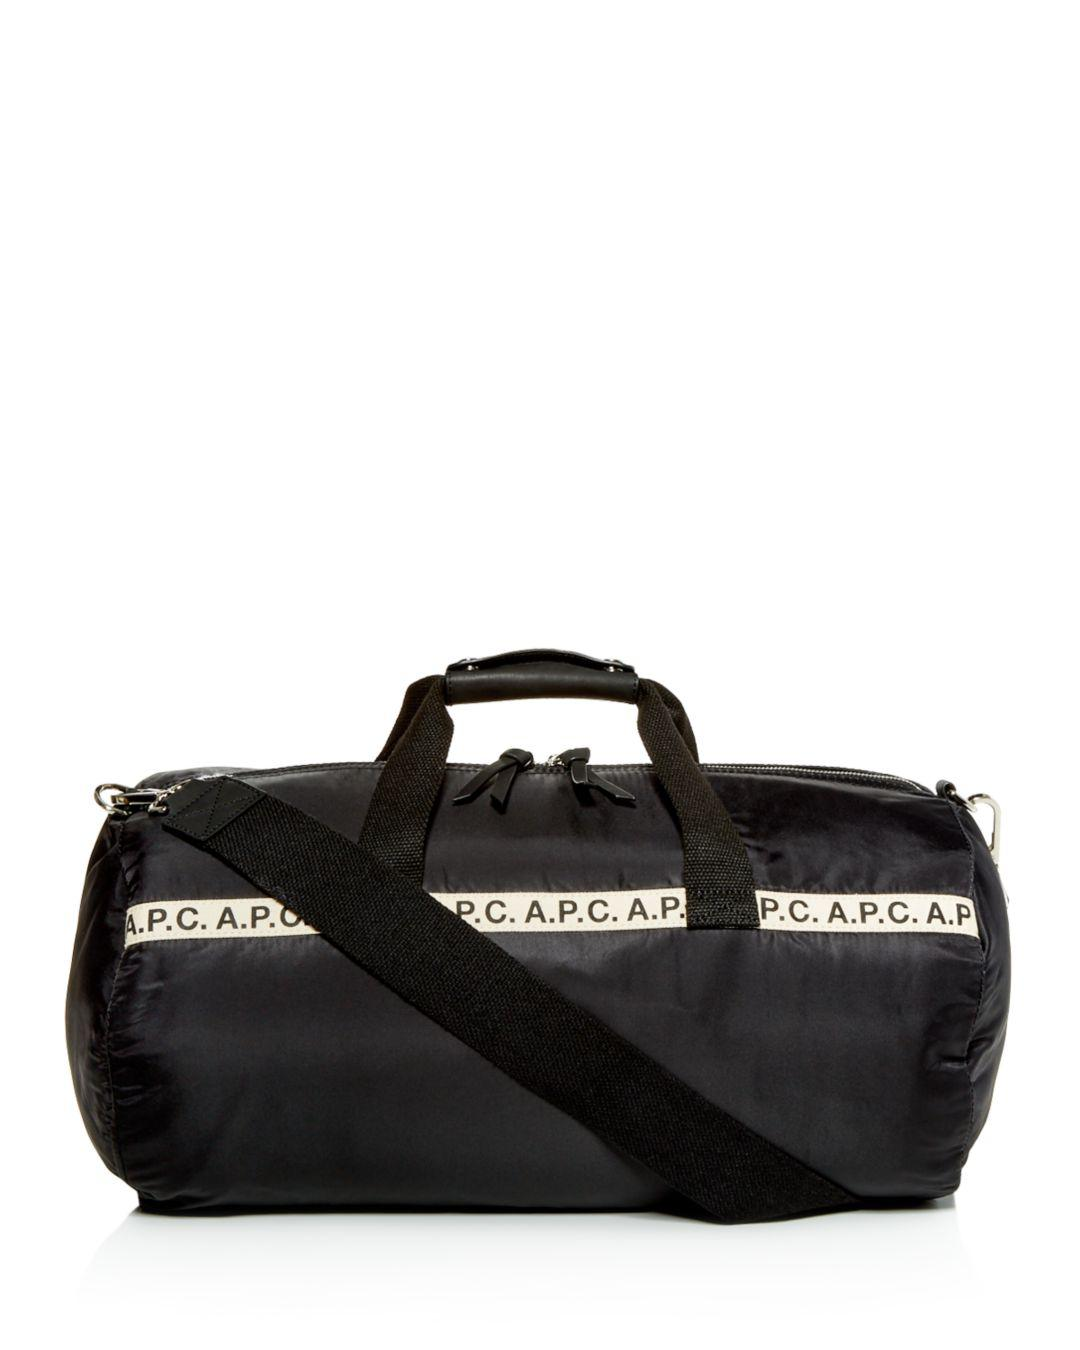 b79030a3bf5d A.P.C. - Black Maybelline Sport Duffel Bag for Men - Lyst. View fullscreen